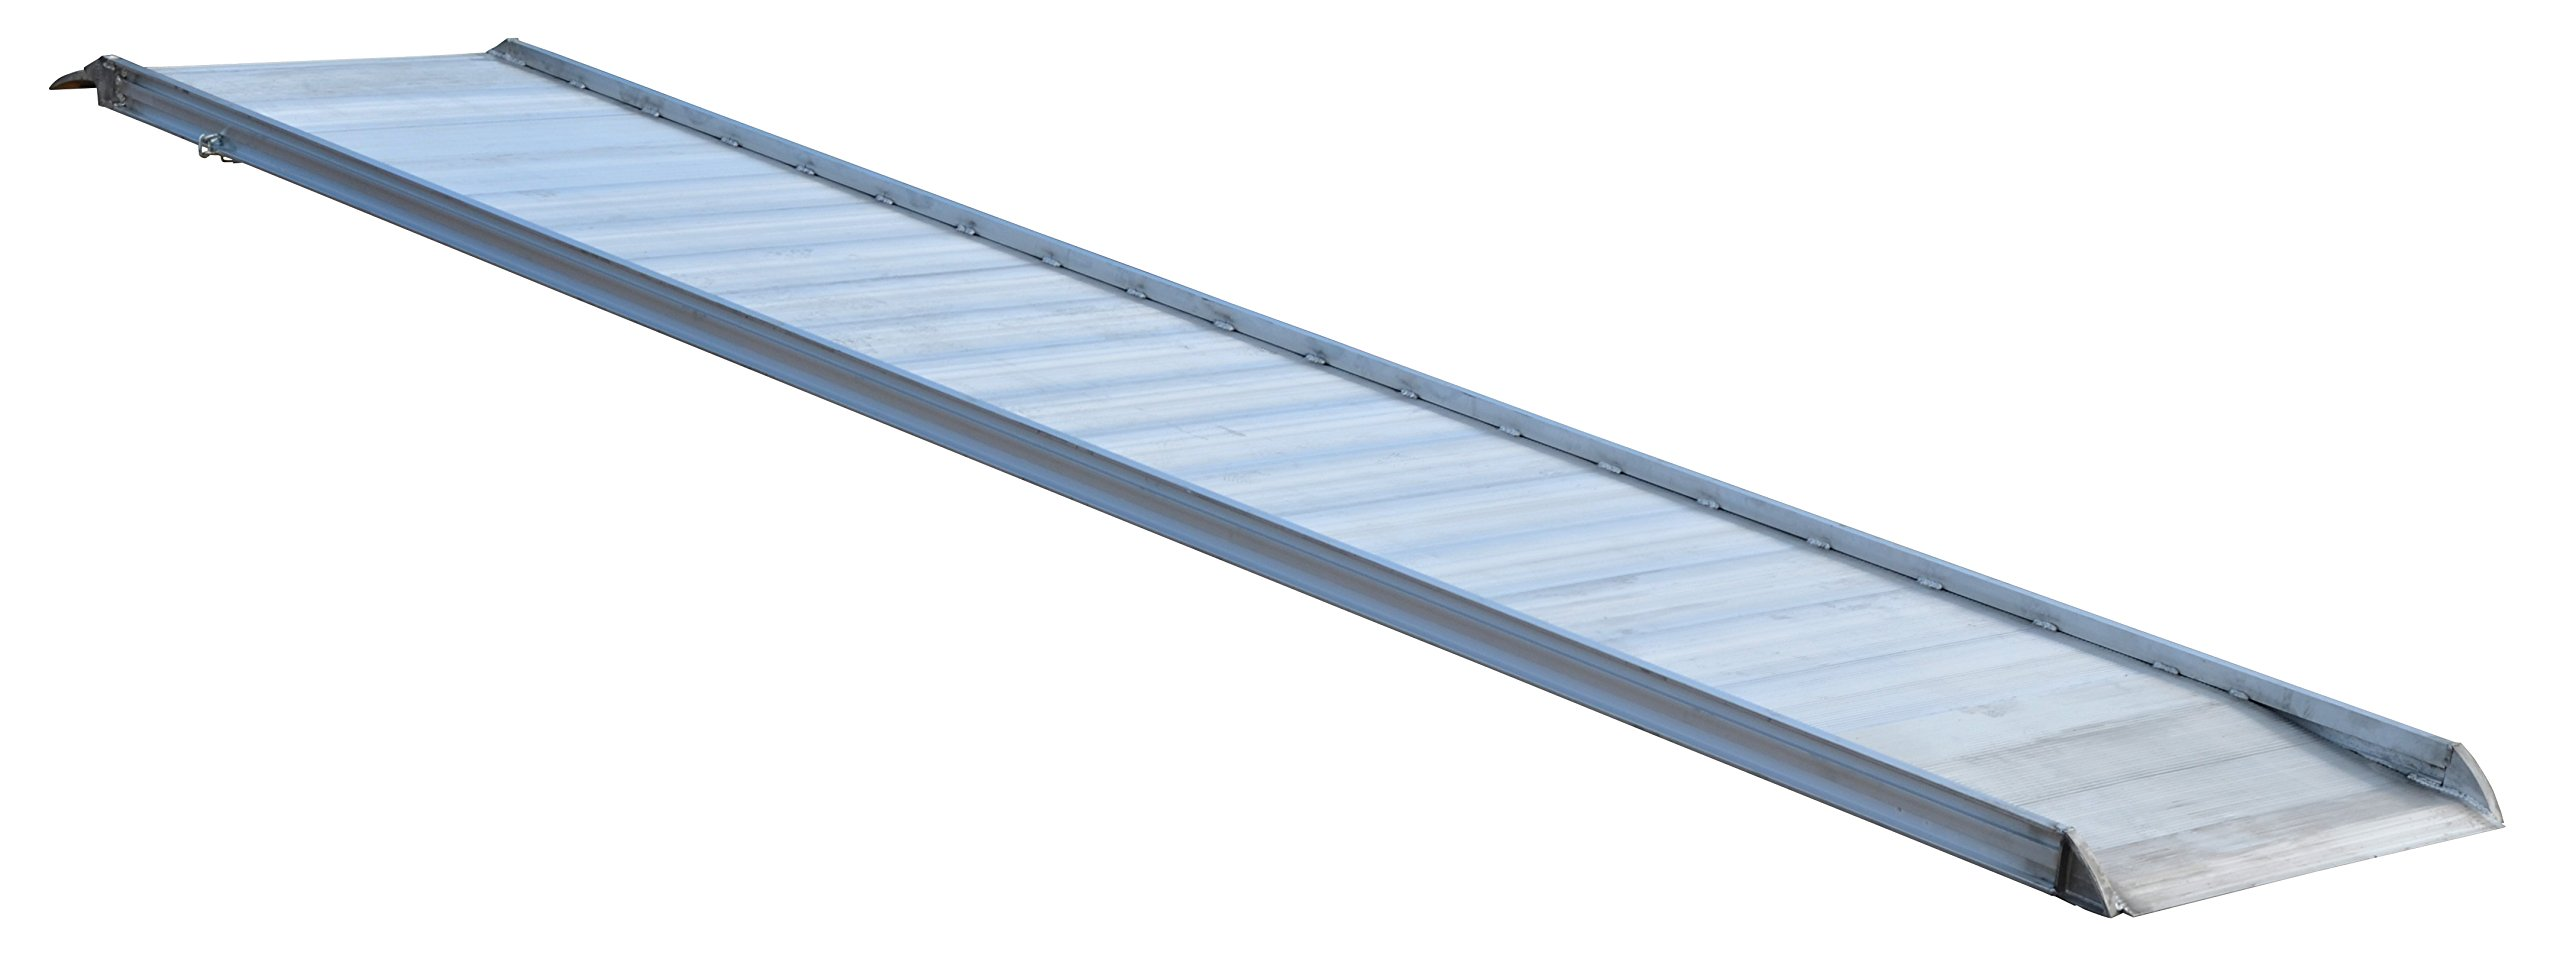 Vestil AWR-38-10B Aluminum Walk Ramp Hook Style, 2200 lb., 120'' Length, 38'' Width, 4.3125'' Height